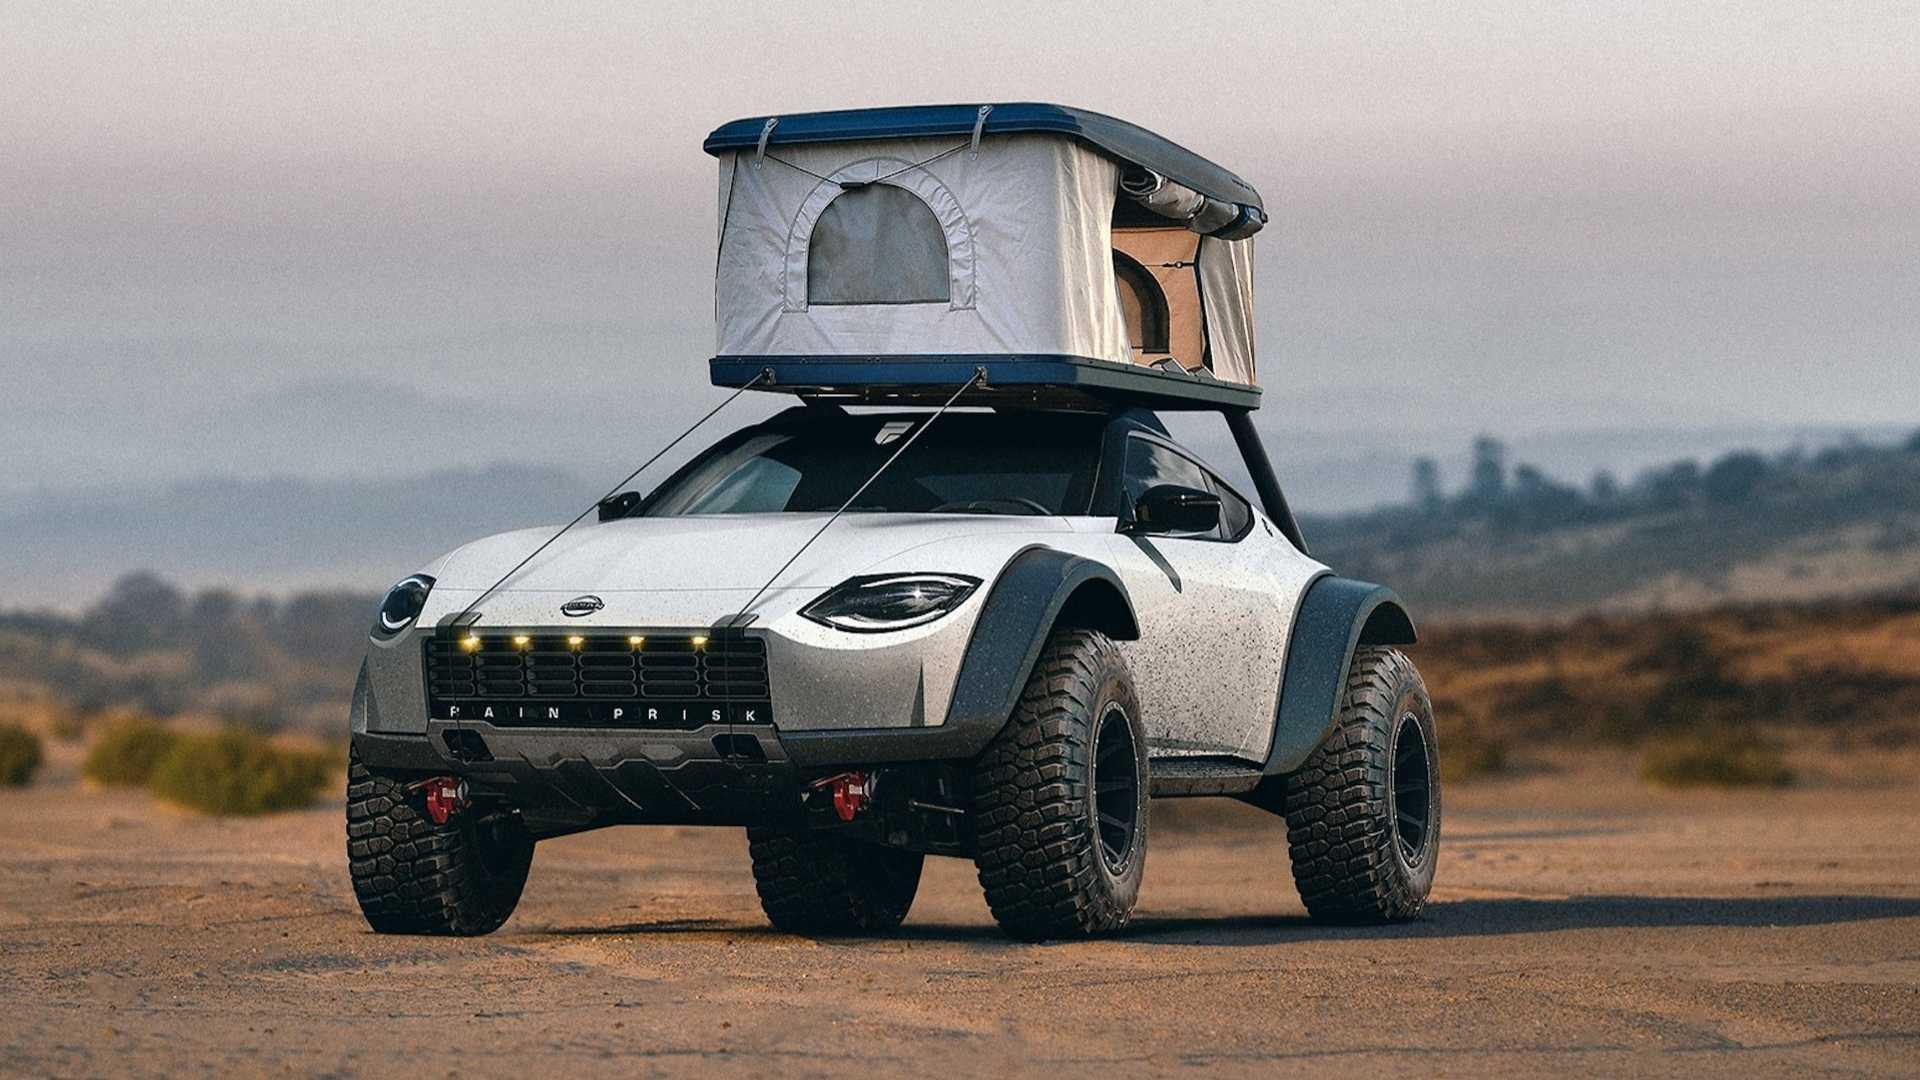 Fan Rendering Imagines A Dirty Nissan Z Proto For Safari Exploration